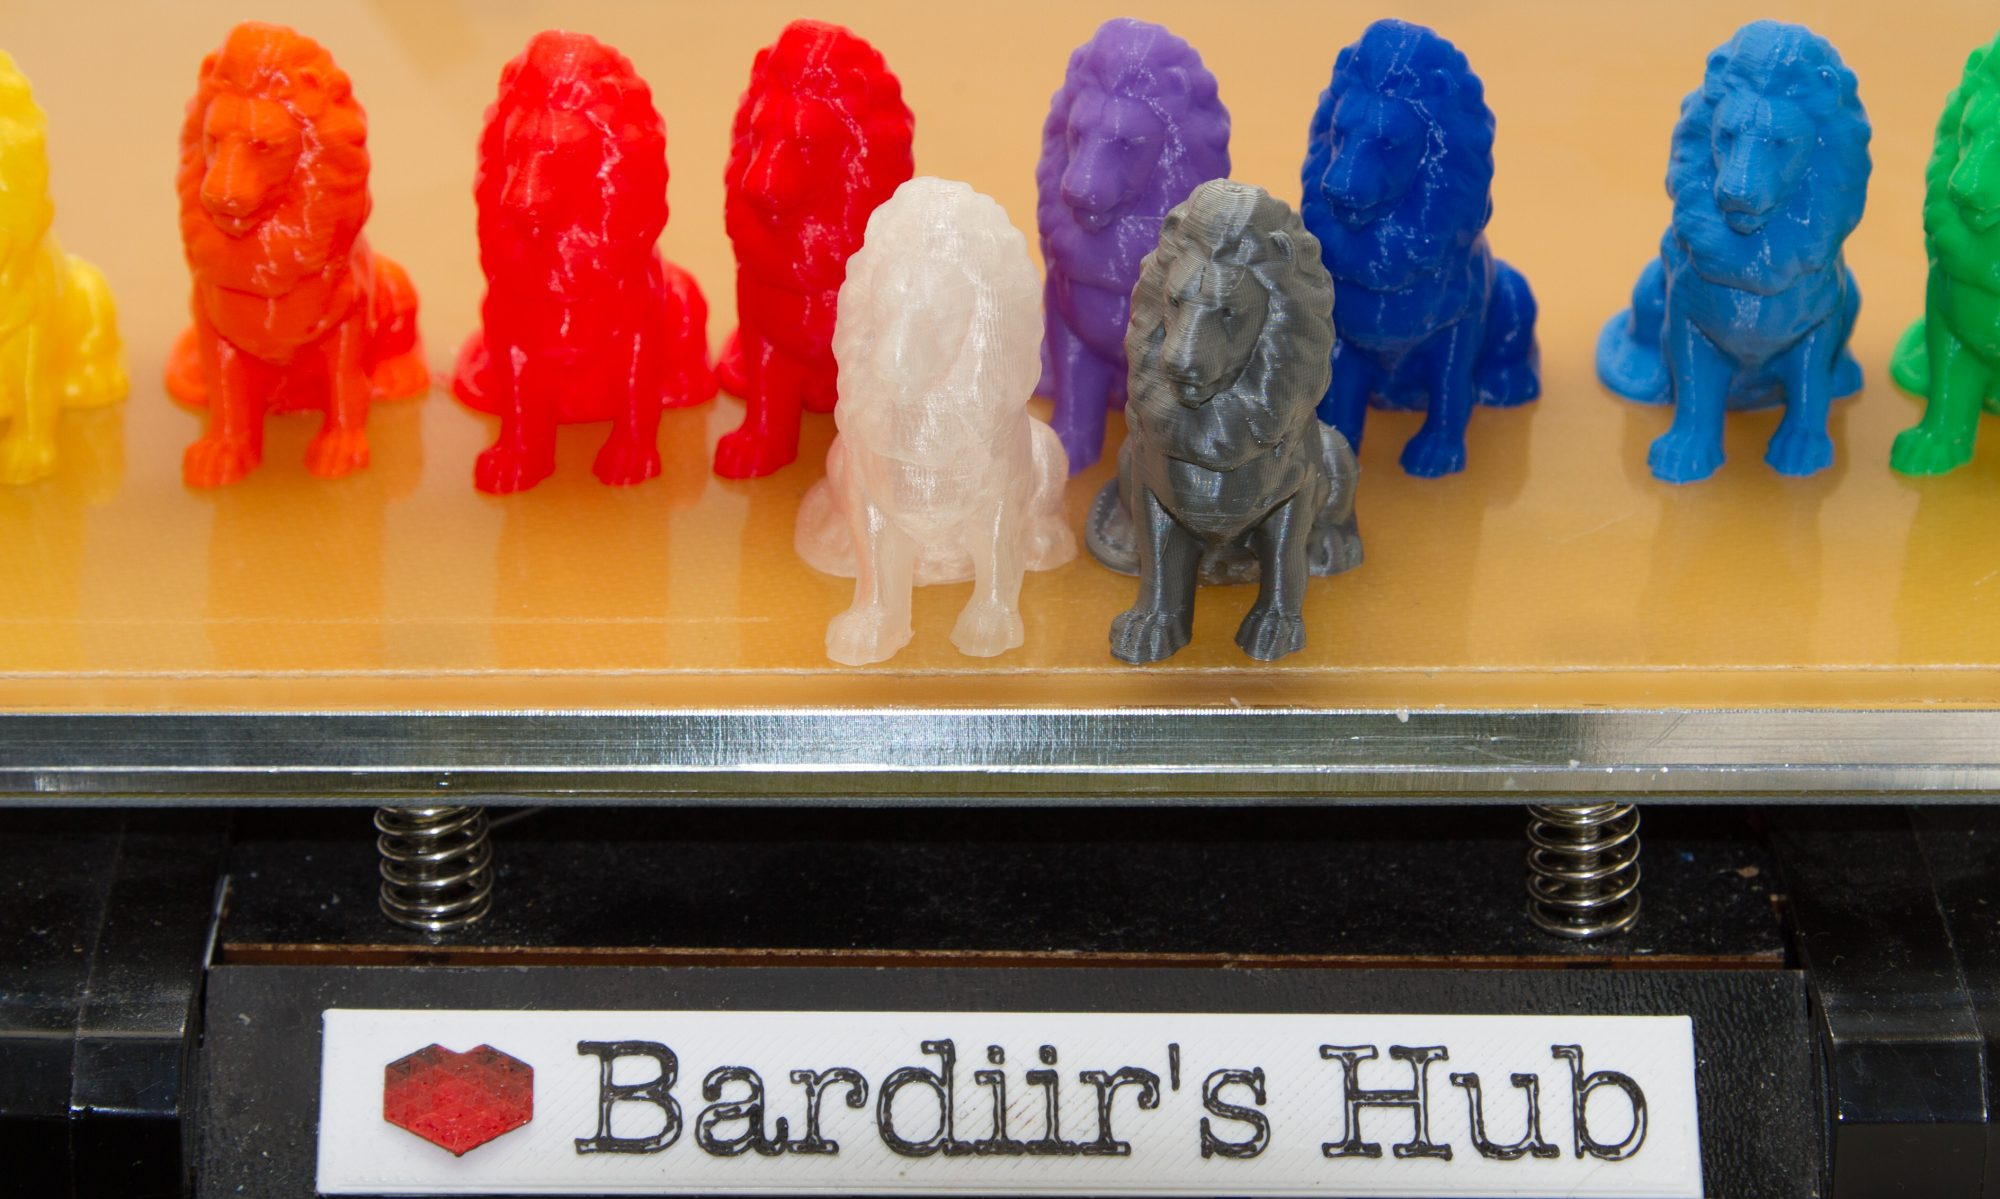 3Drt / Bardiir's Hub